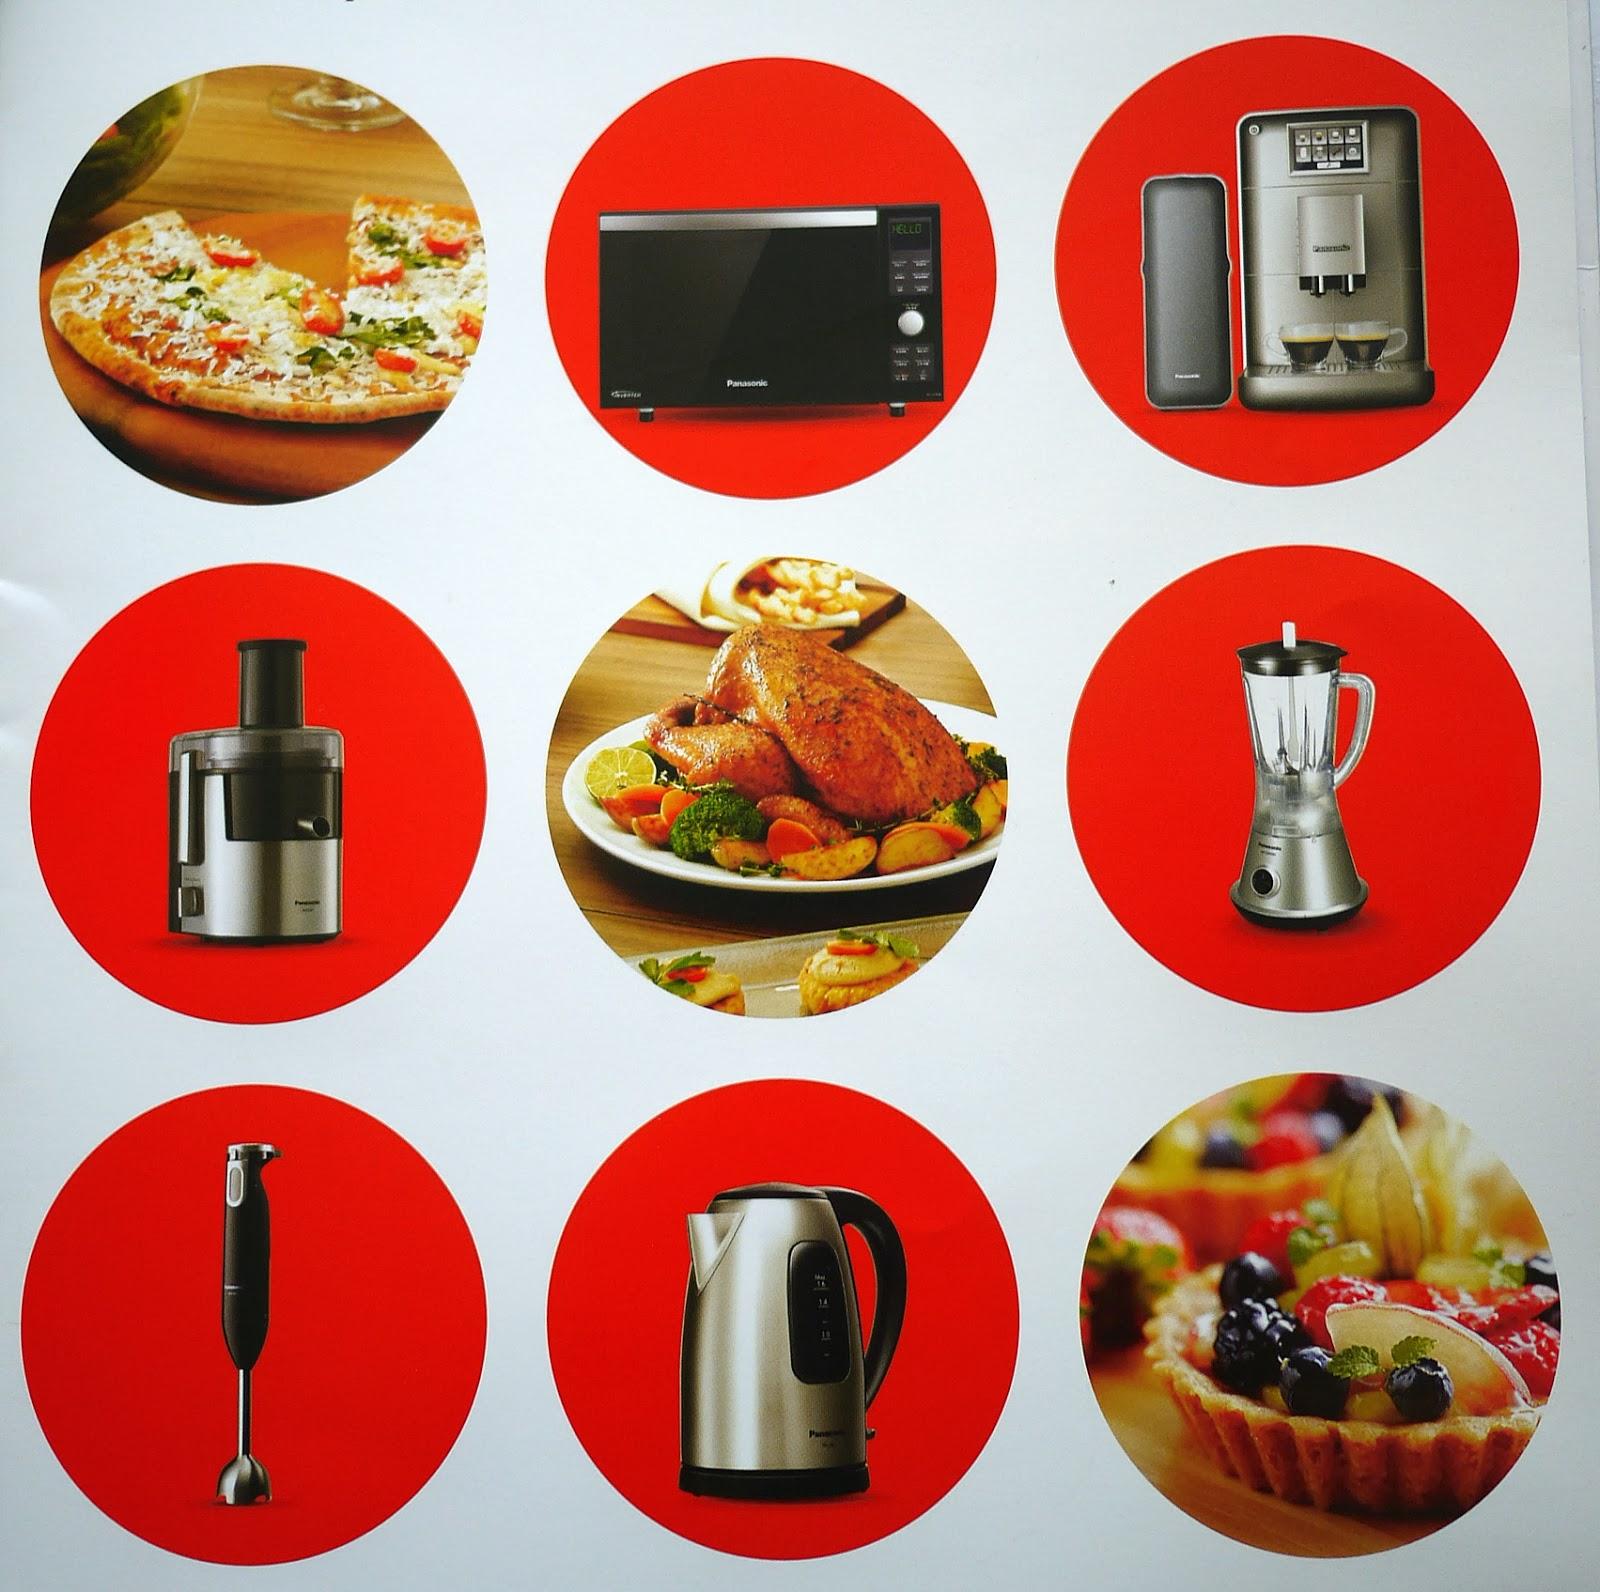 Masterchef Kitchen Appliances Ami Schaheera Lifestyle Panasonic Cooking Opens Up Possibilities